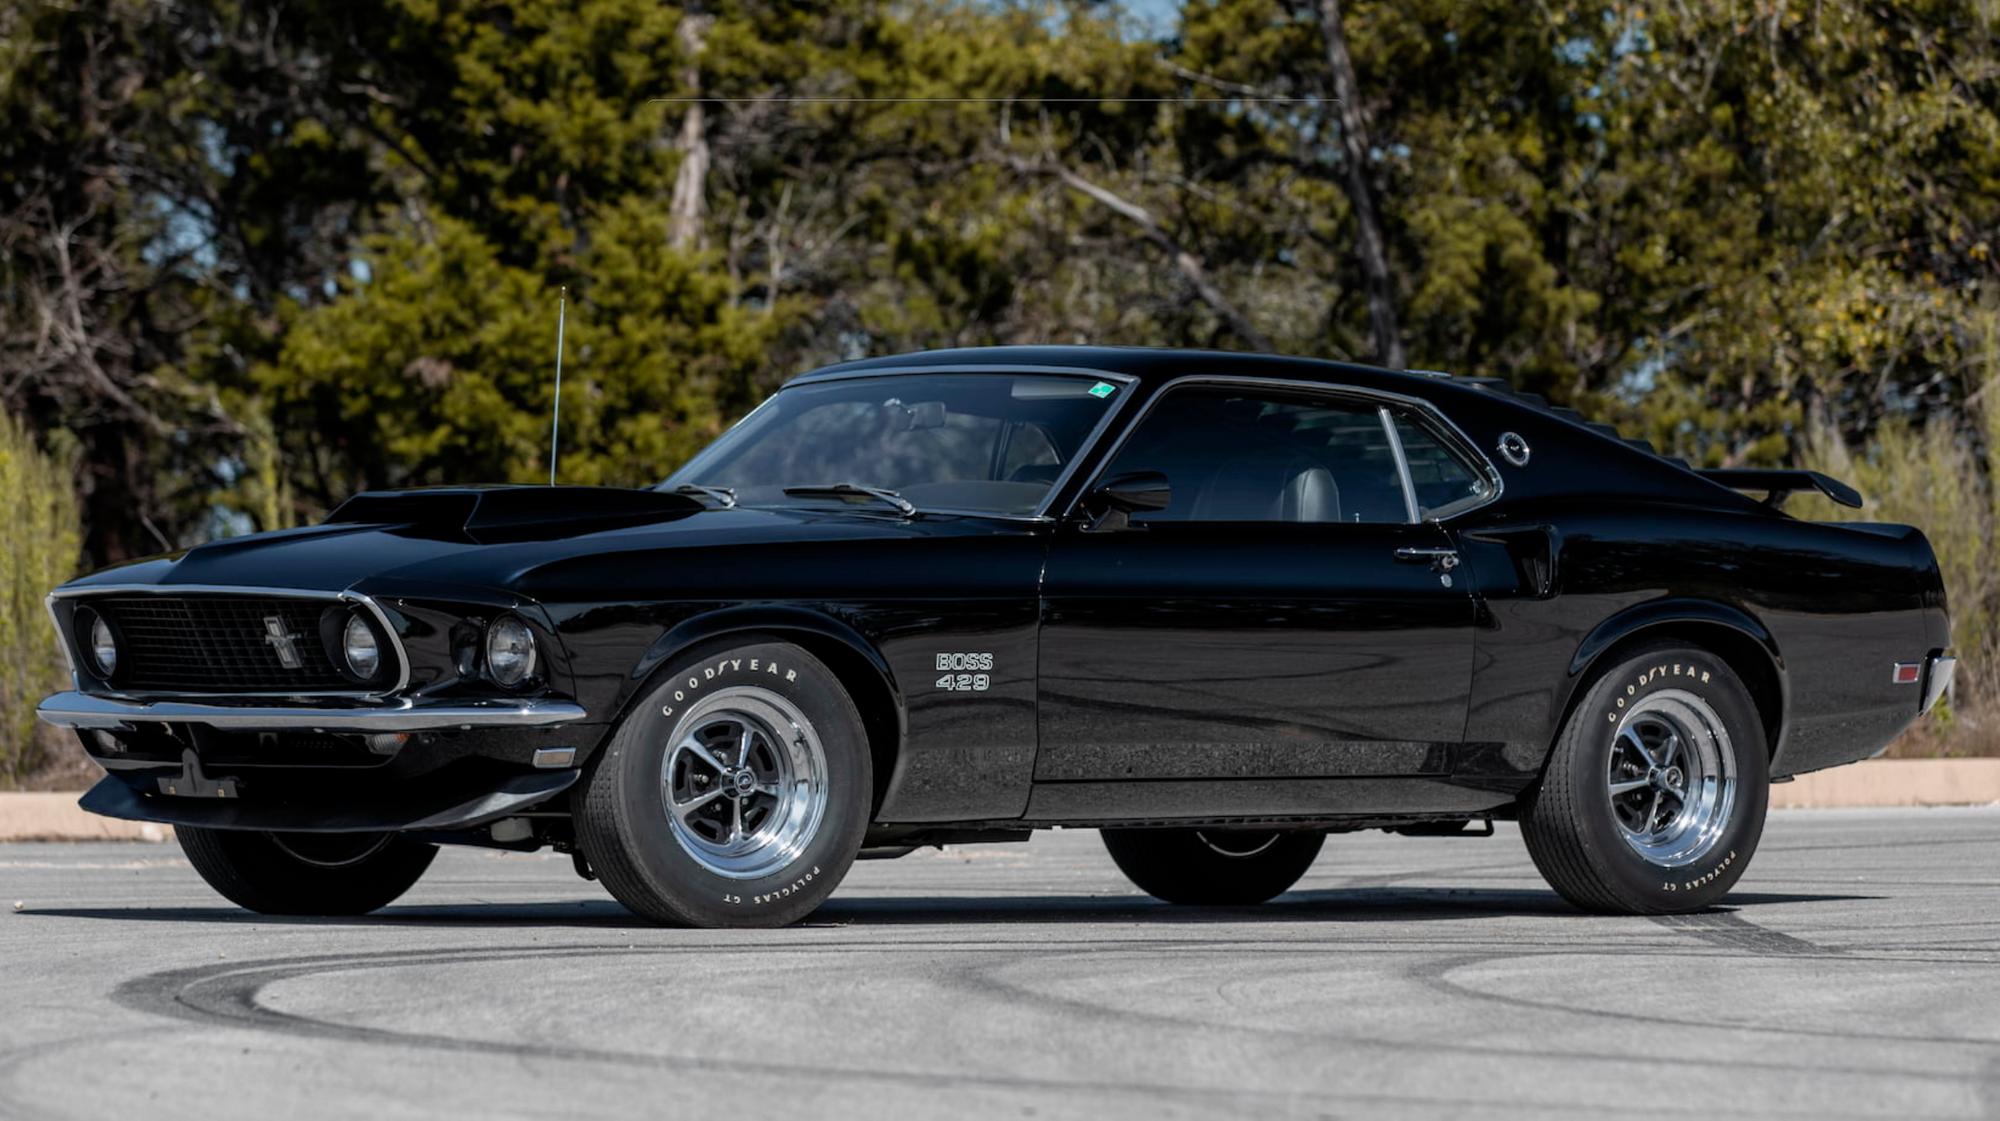 "<img src=""1969-boss-429.png"" alt=""The late Paul Walker's 1969 Ford Mustang Boss 429"">"